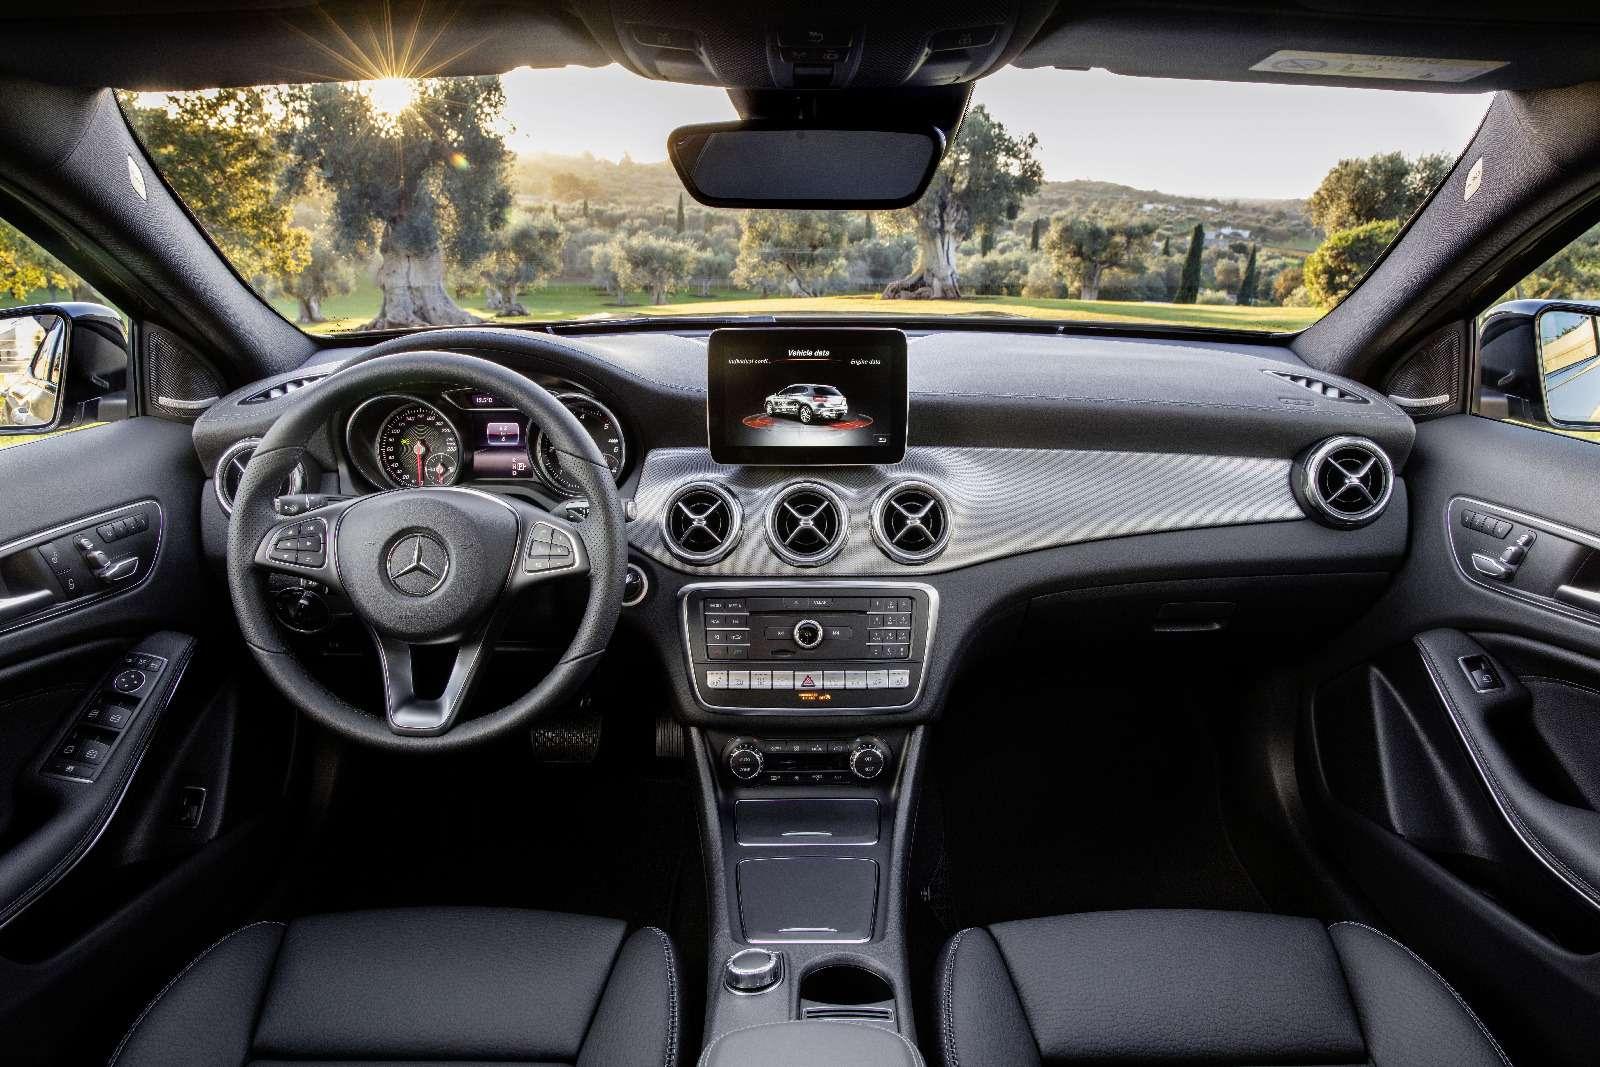 Mercedes-Benz GLA стал краше, ноне просторнее— фото 690063